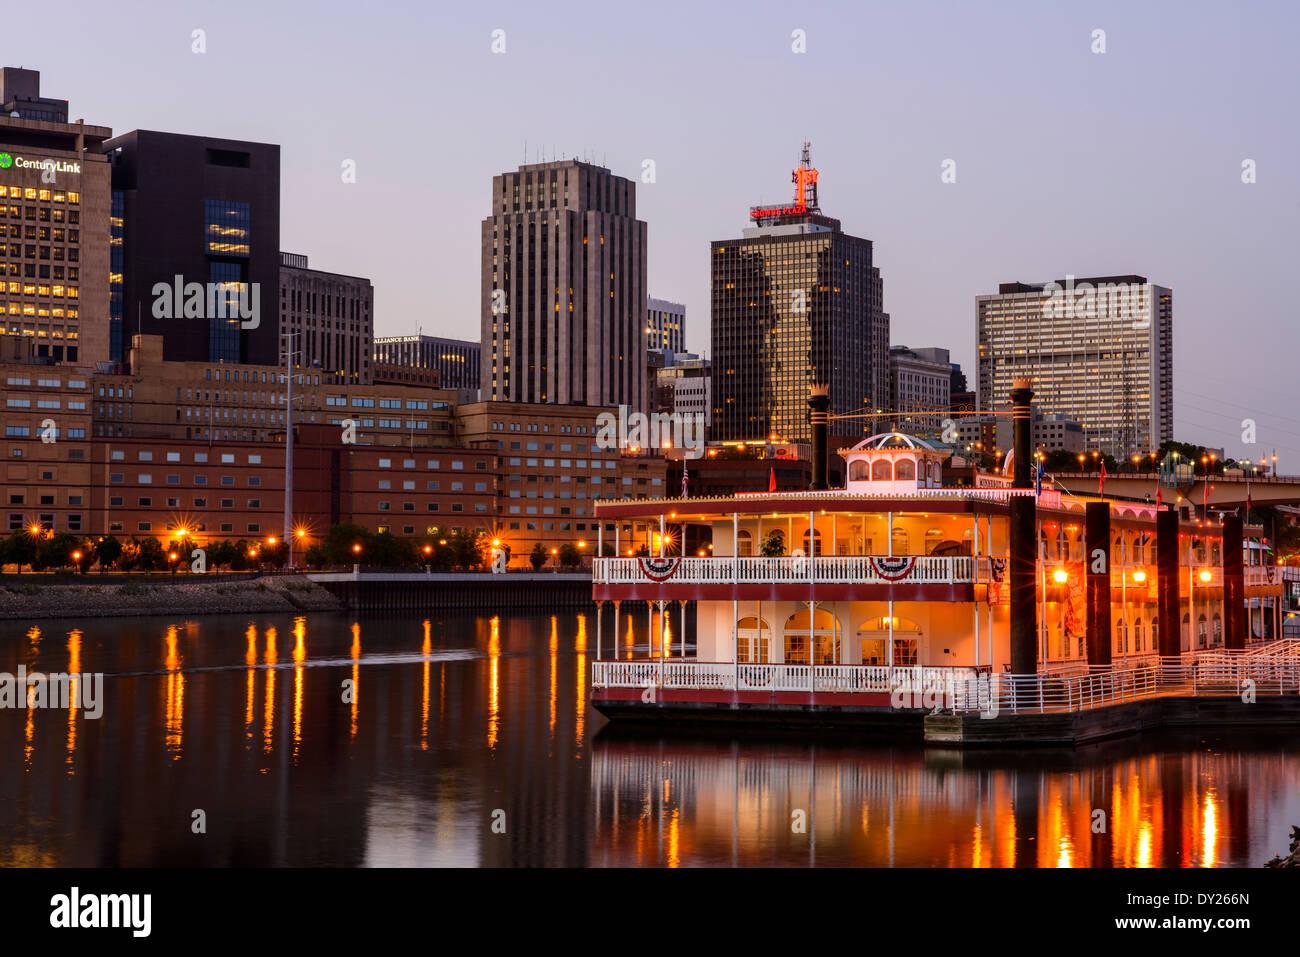 Saint Paul, Minnesota skyline with river boat at dusk. - Stock Image